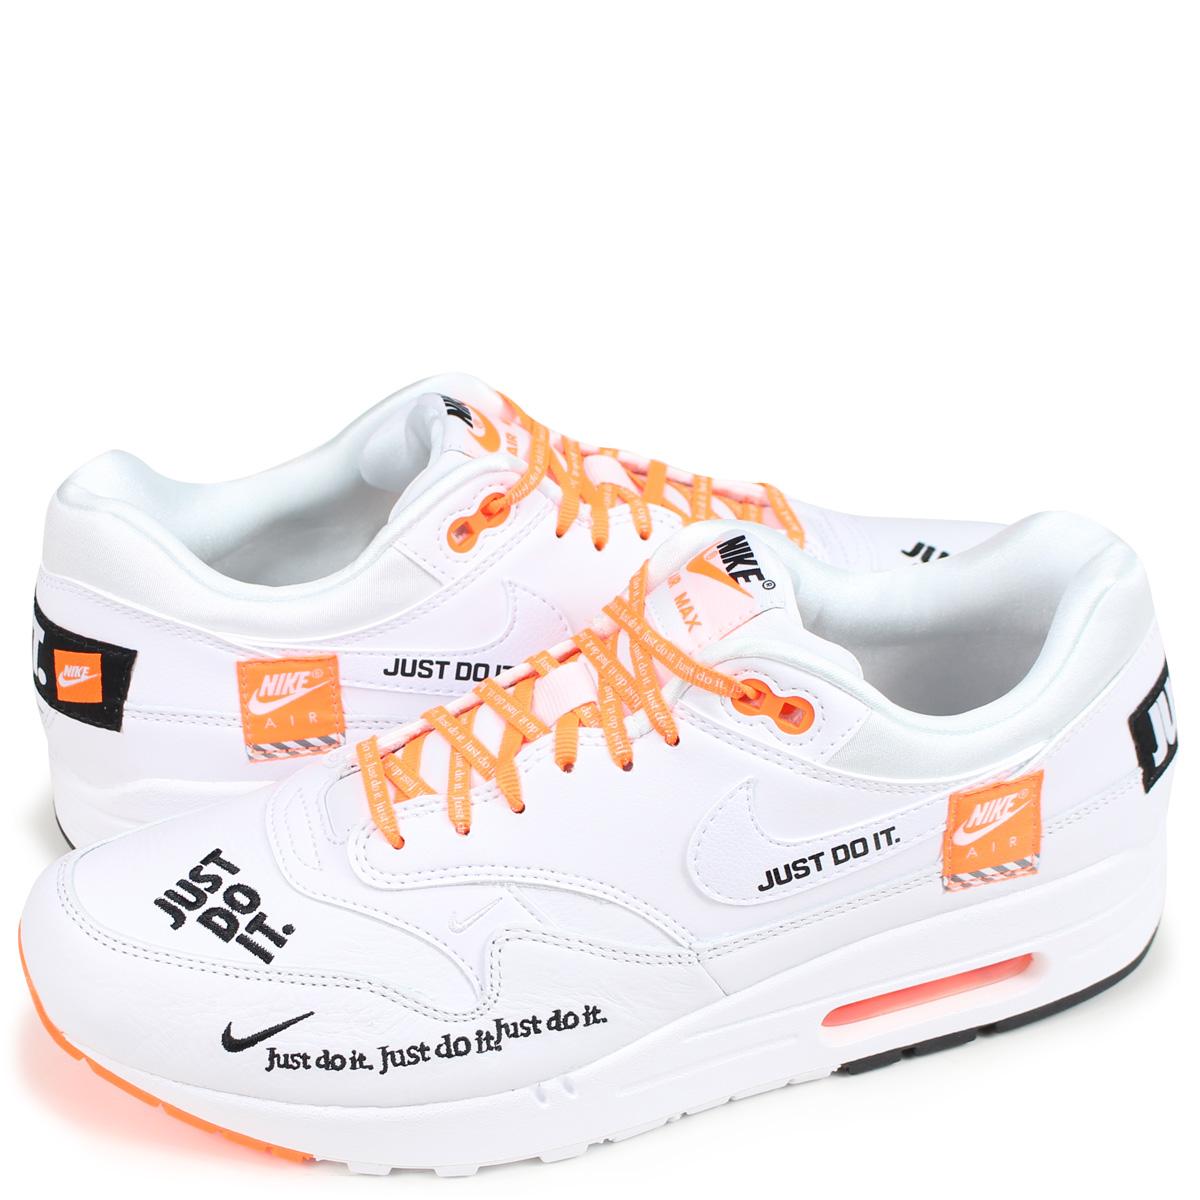 NIKE WMNS AIR MAX 1 LX Kie Ney AMAX 1 sneakers men 917,691 100 white